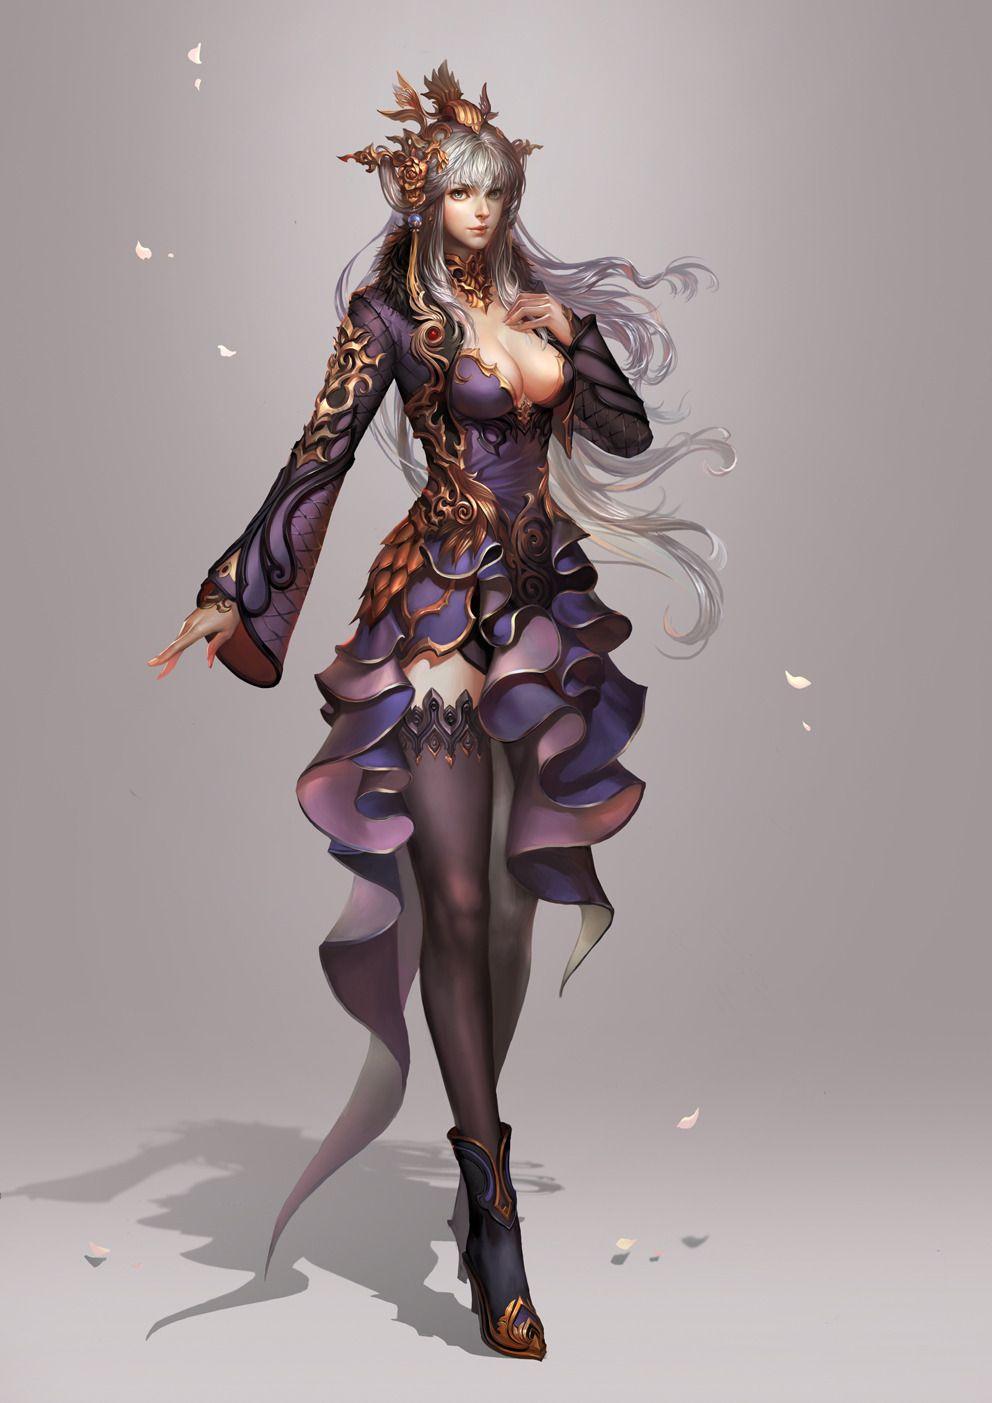 Painted Skin 2d Fantasy Character Girl Woman Girls Art